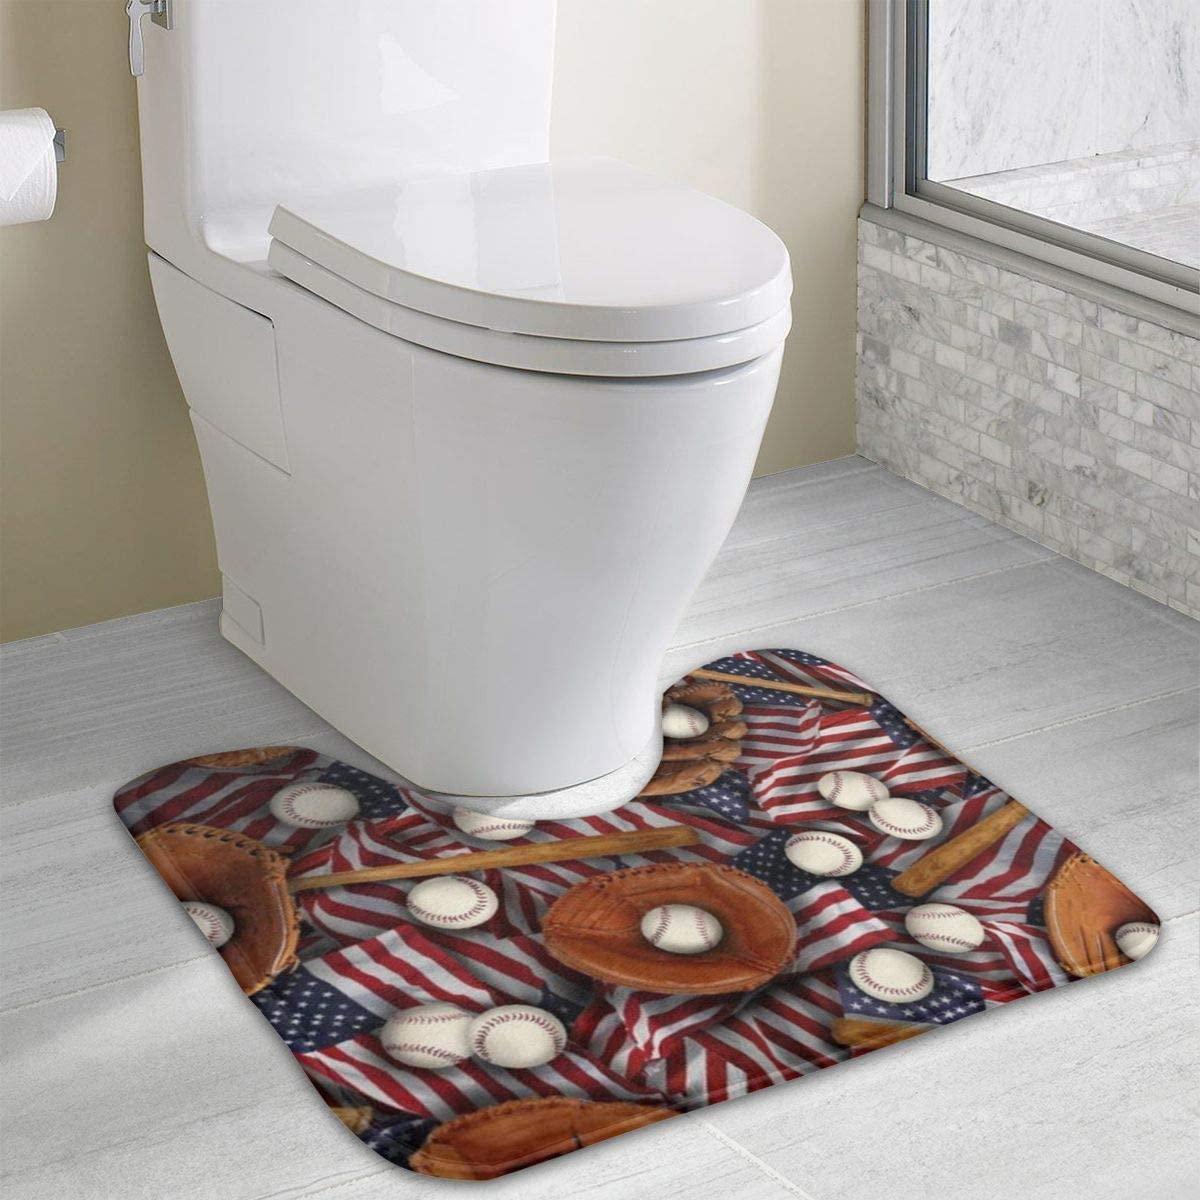 Bathroom Rug, Baseballs U-Shaped Non Slip Absorbent Toilet Bath Floor Contour Doormat Shower Mat Carpet 19.3 X 15.7 Inch